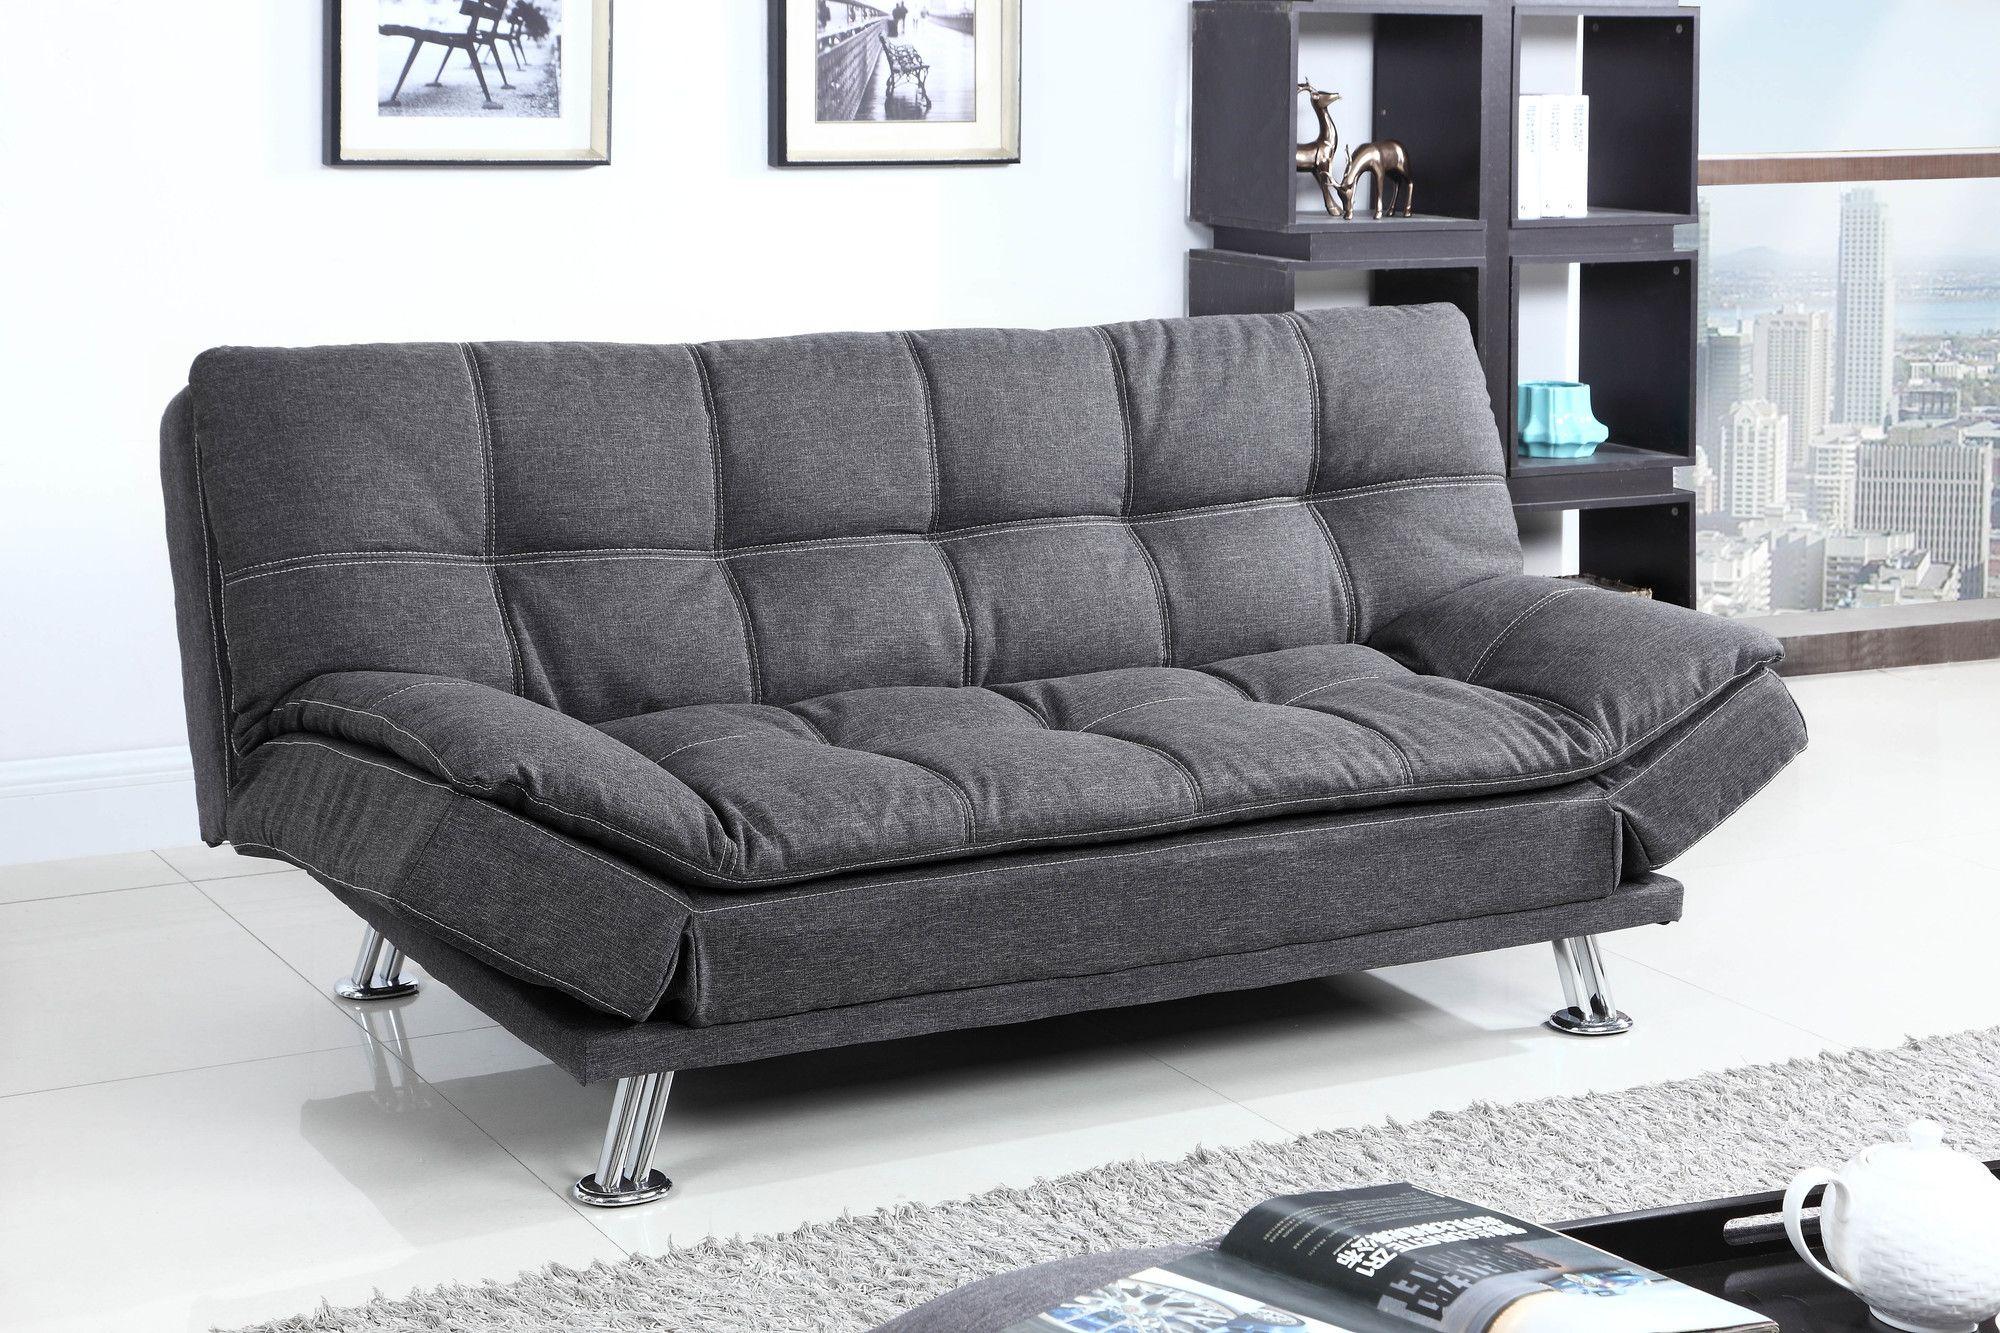 Convertible sofa convertible and products